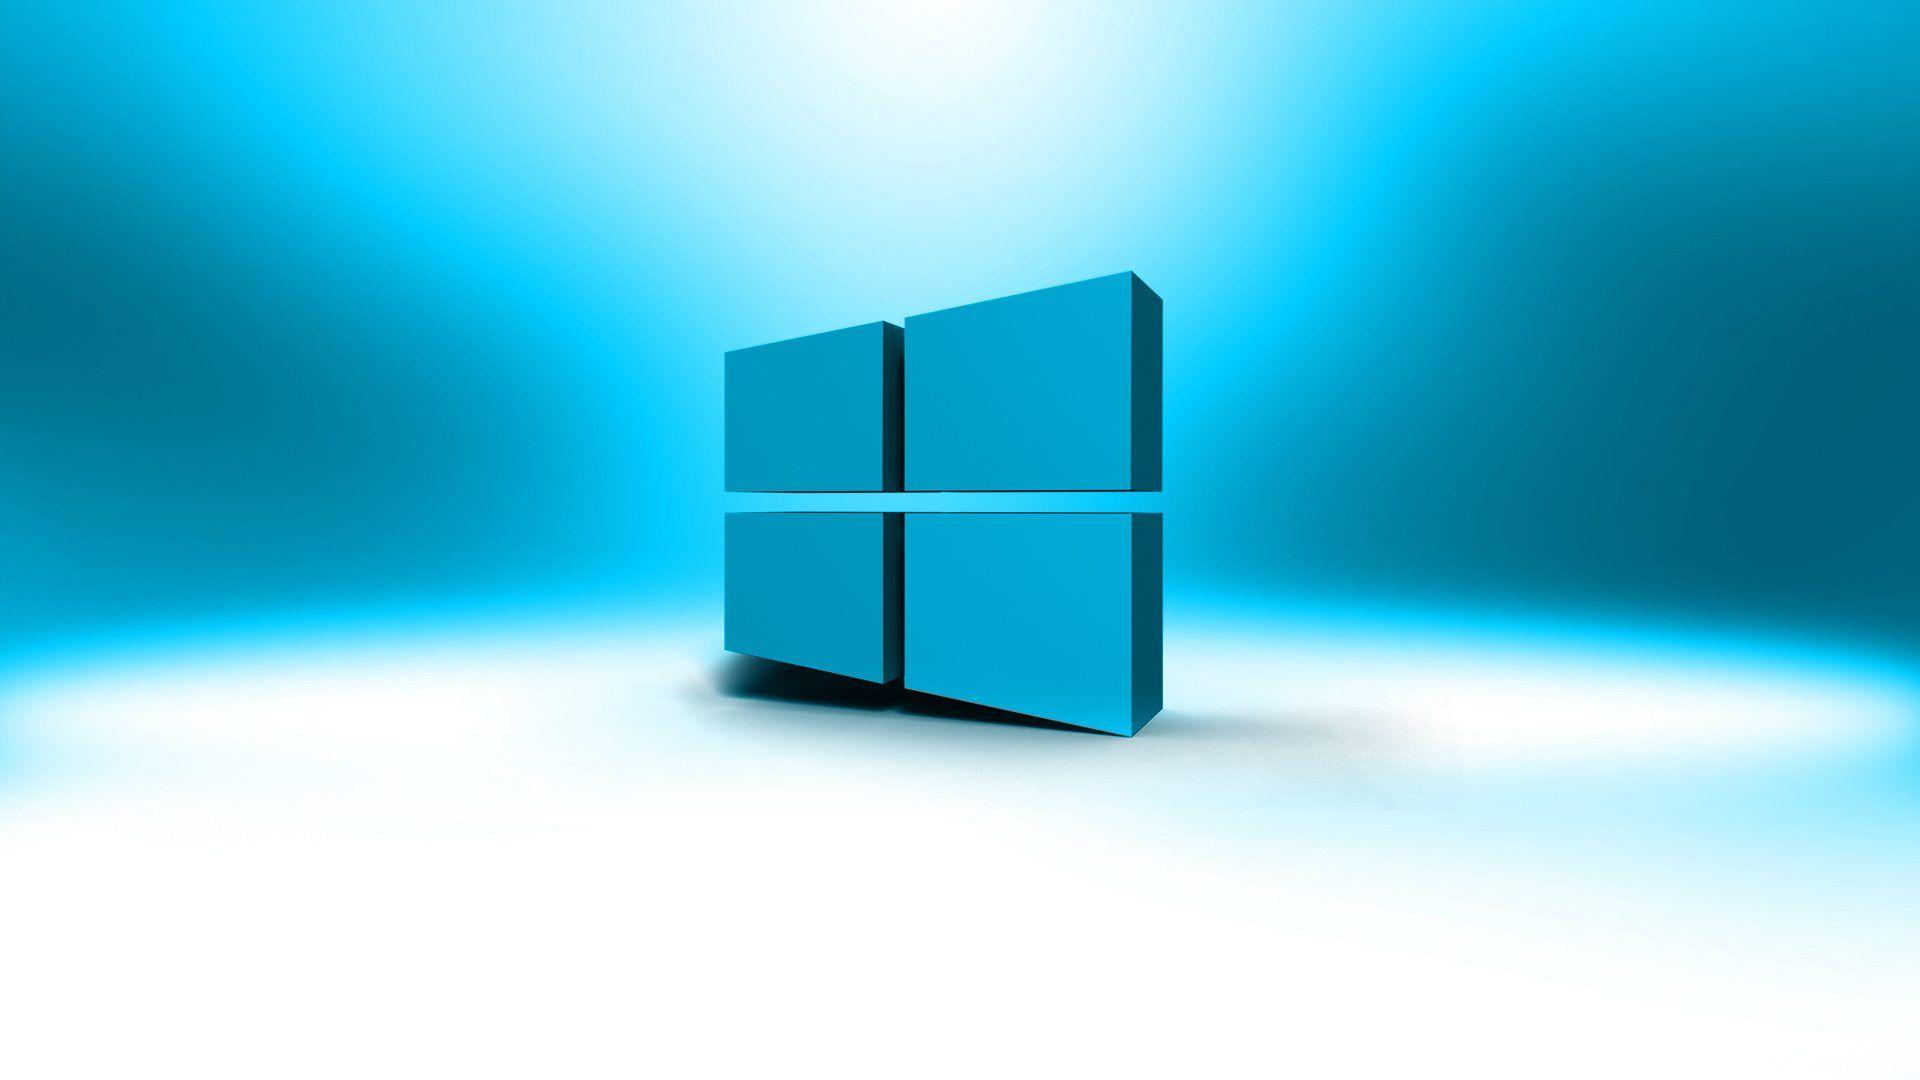 Xbox One Update Brings Cortana Uwp Blot Gaming Windows Wallpaper Wallpaper Windows 10 Hd Wallpaper Desktop